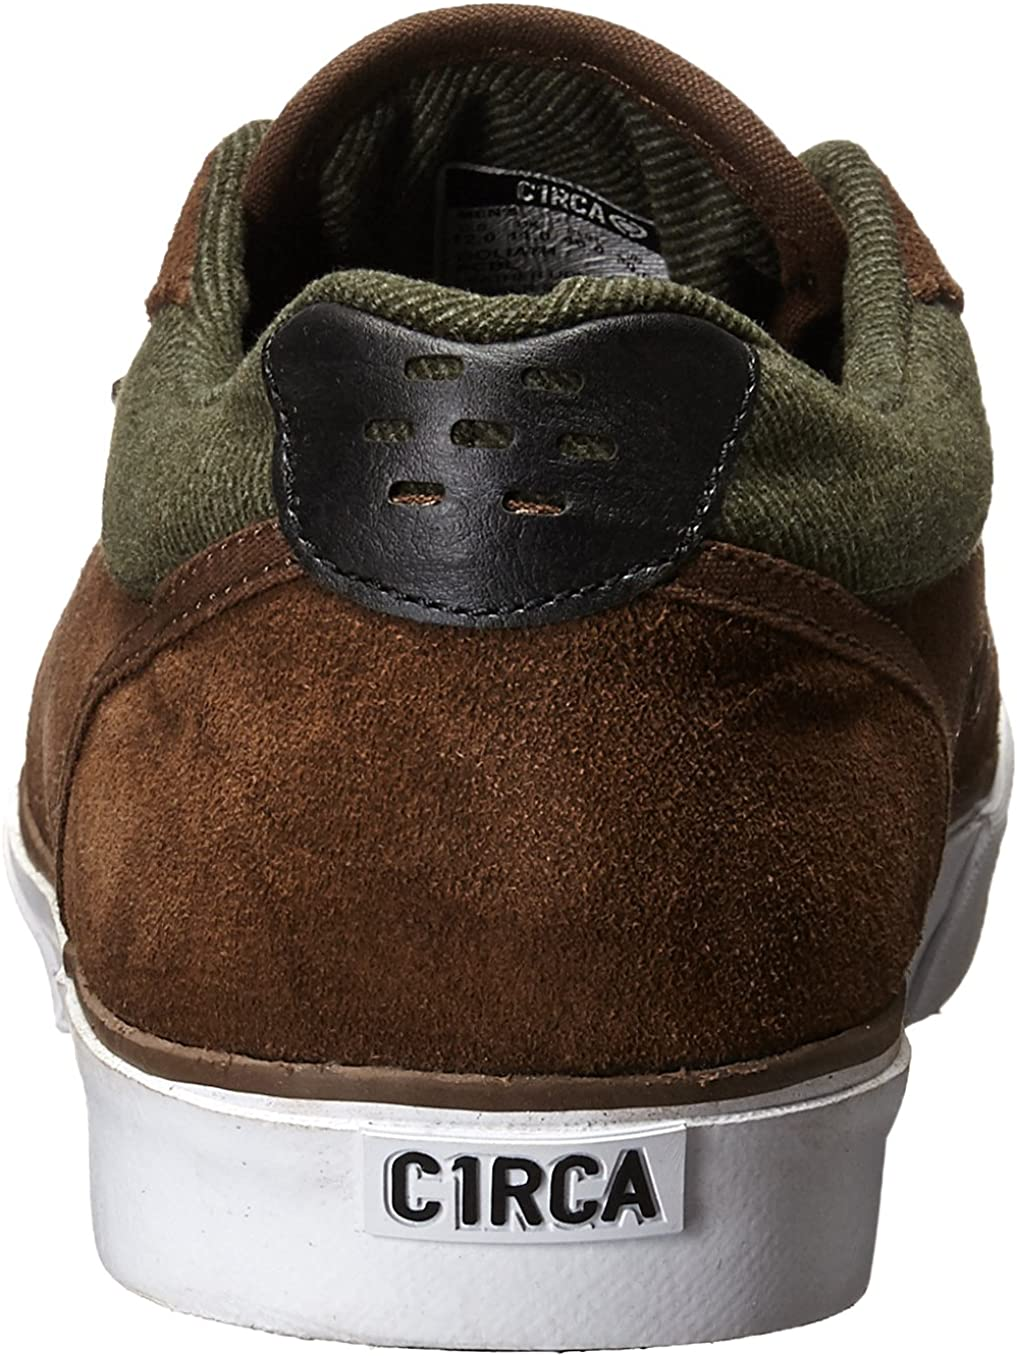 C1RCA Mens Goliath Skate Shoe